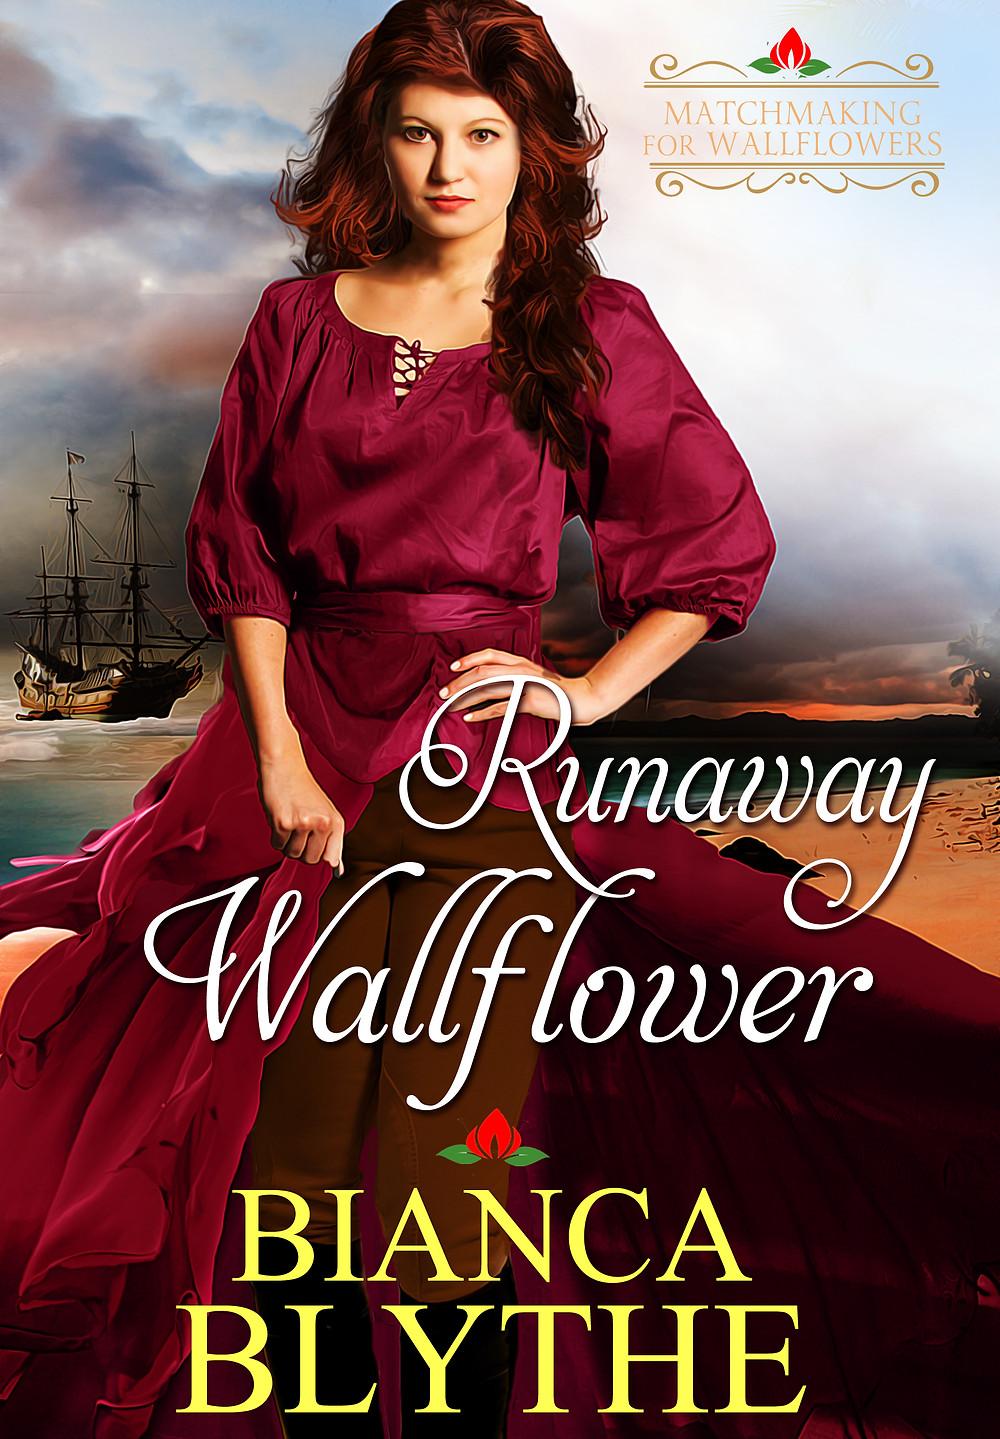 RUNAWAY WALLFLOWER by Bianca Blythe